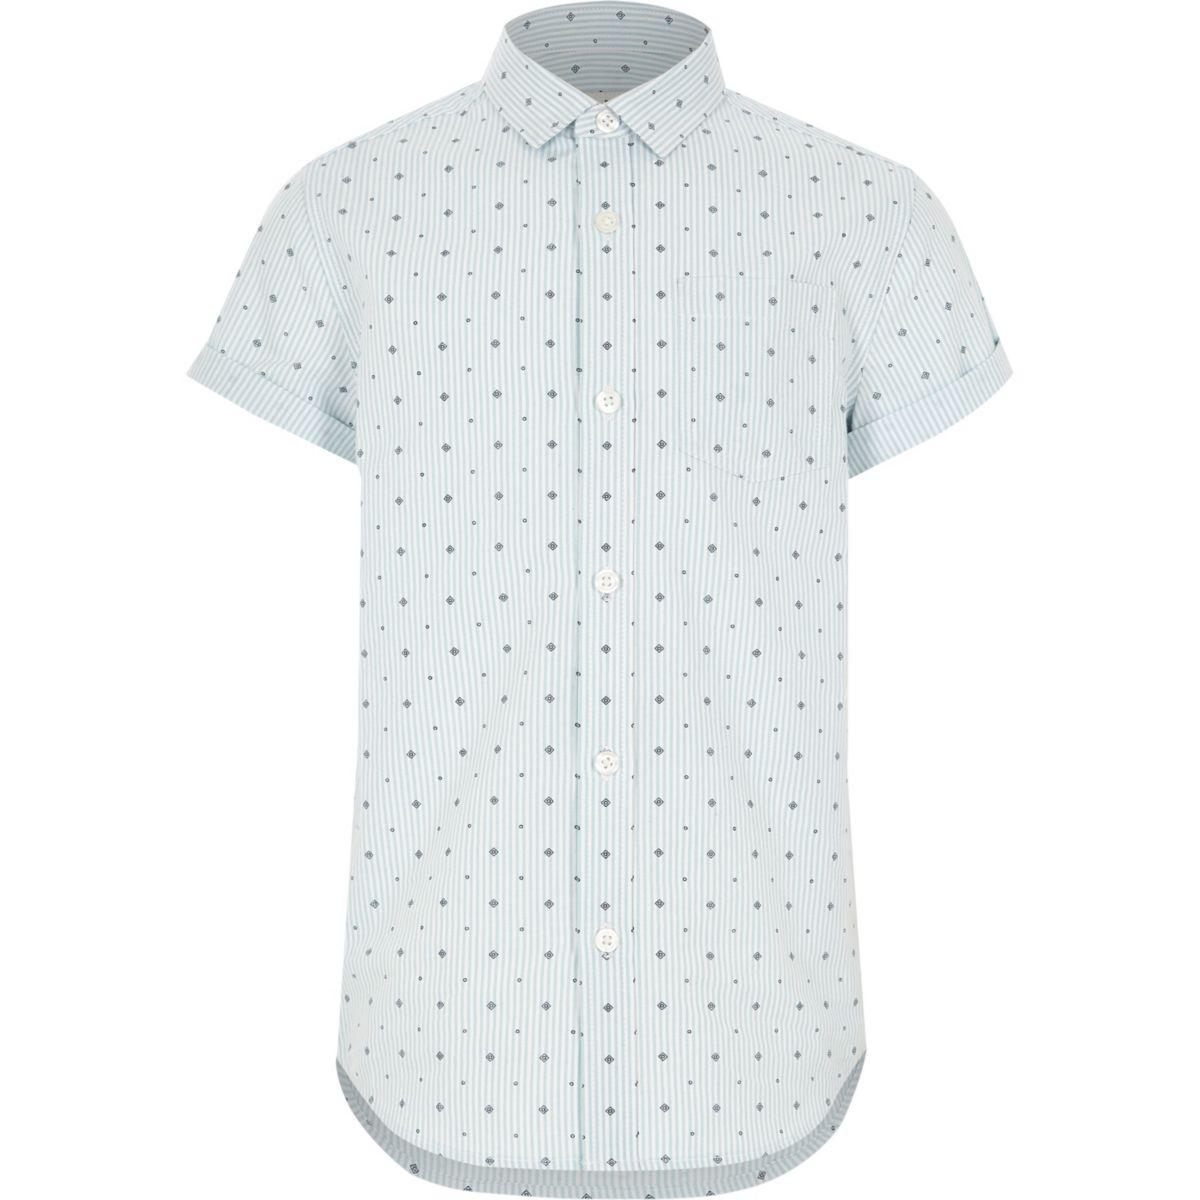 Boys light green printed short sleeve shirt